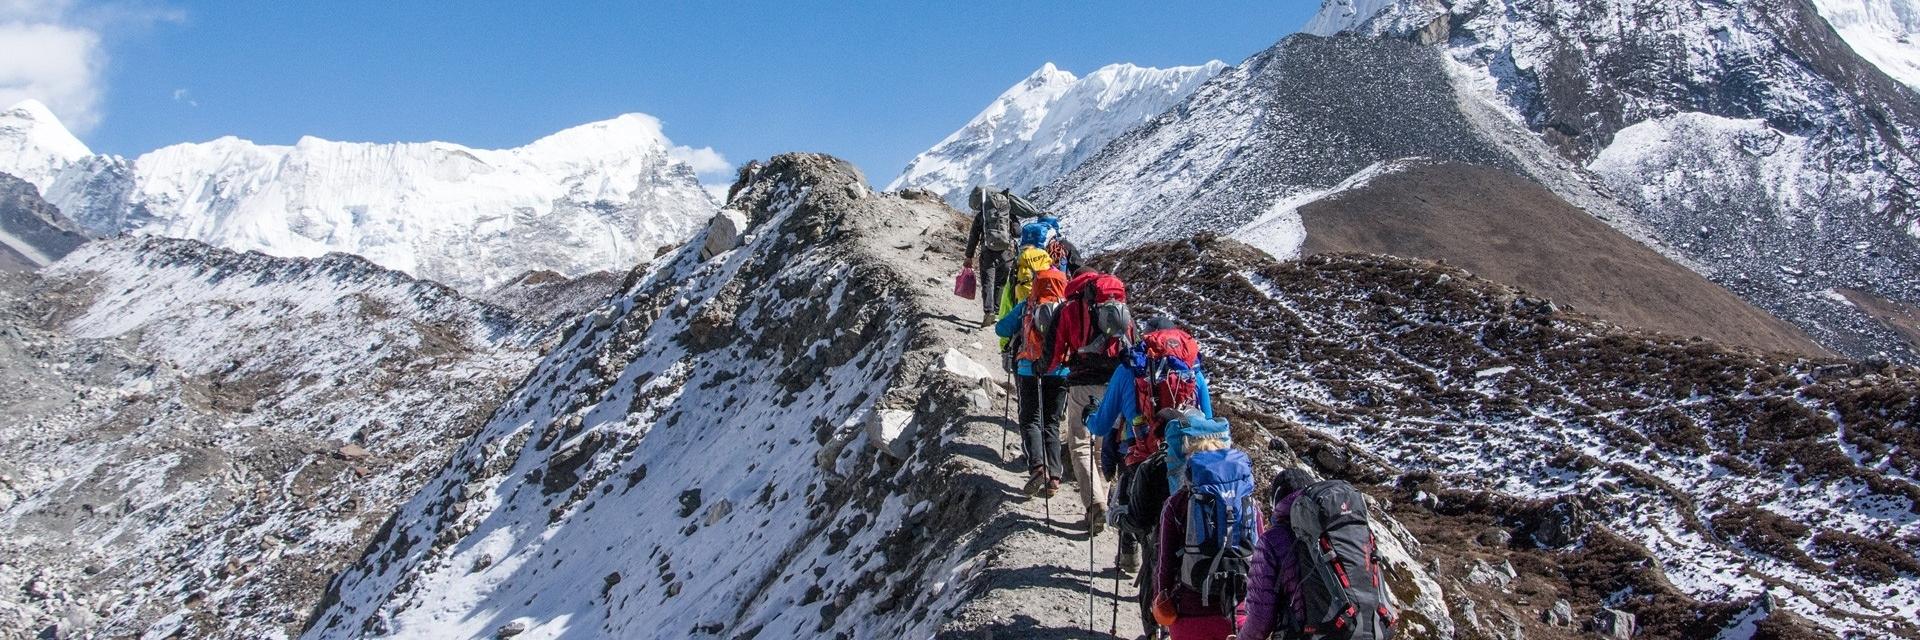 https://gody.vn/blog/cam-nang-trekking/post/10-cung-duong-trekking-dep-nhat-nepal-ban-khong-the-bo-lo-phan-2-1468